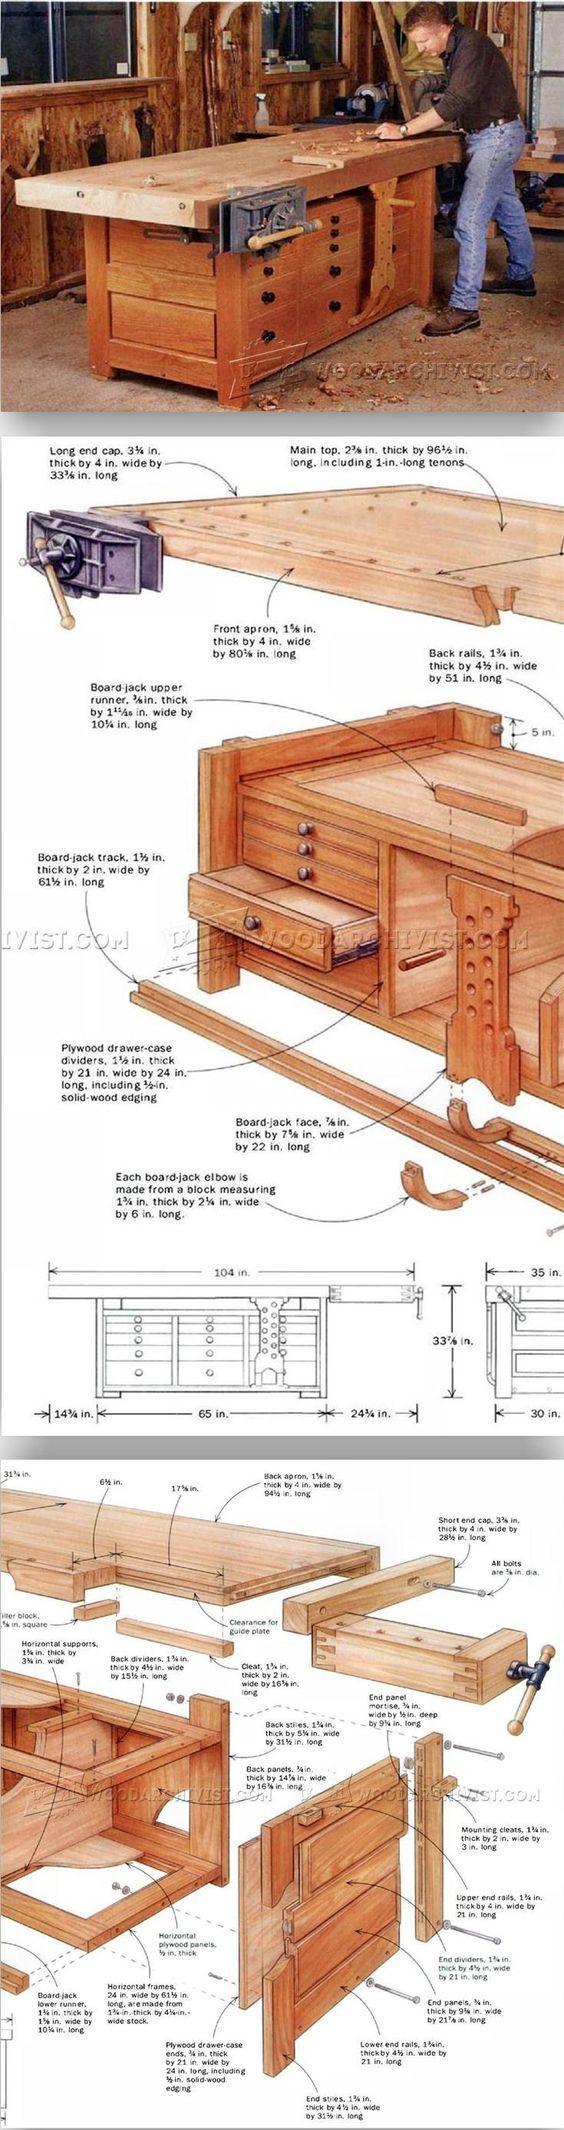 Rock-Solid Workbench Plans - Workshop Solutions Plans, Tips and Tricks | WoodArchivist.com